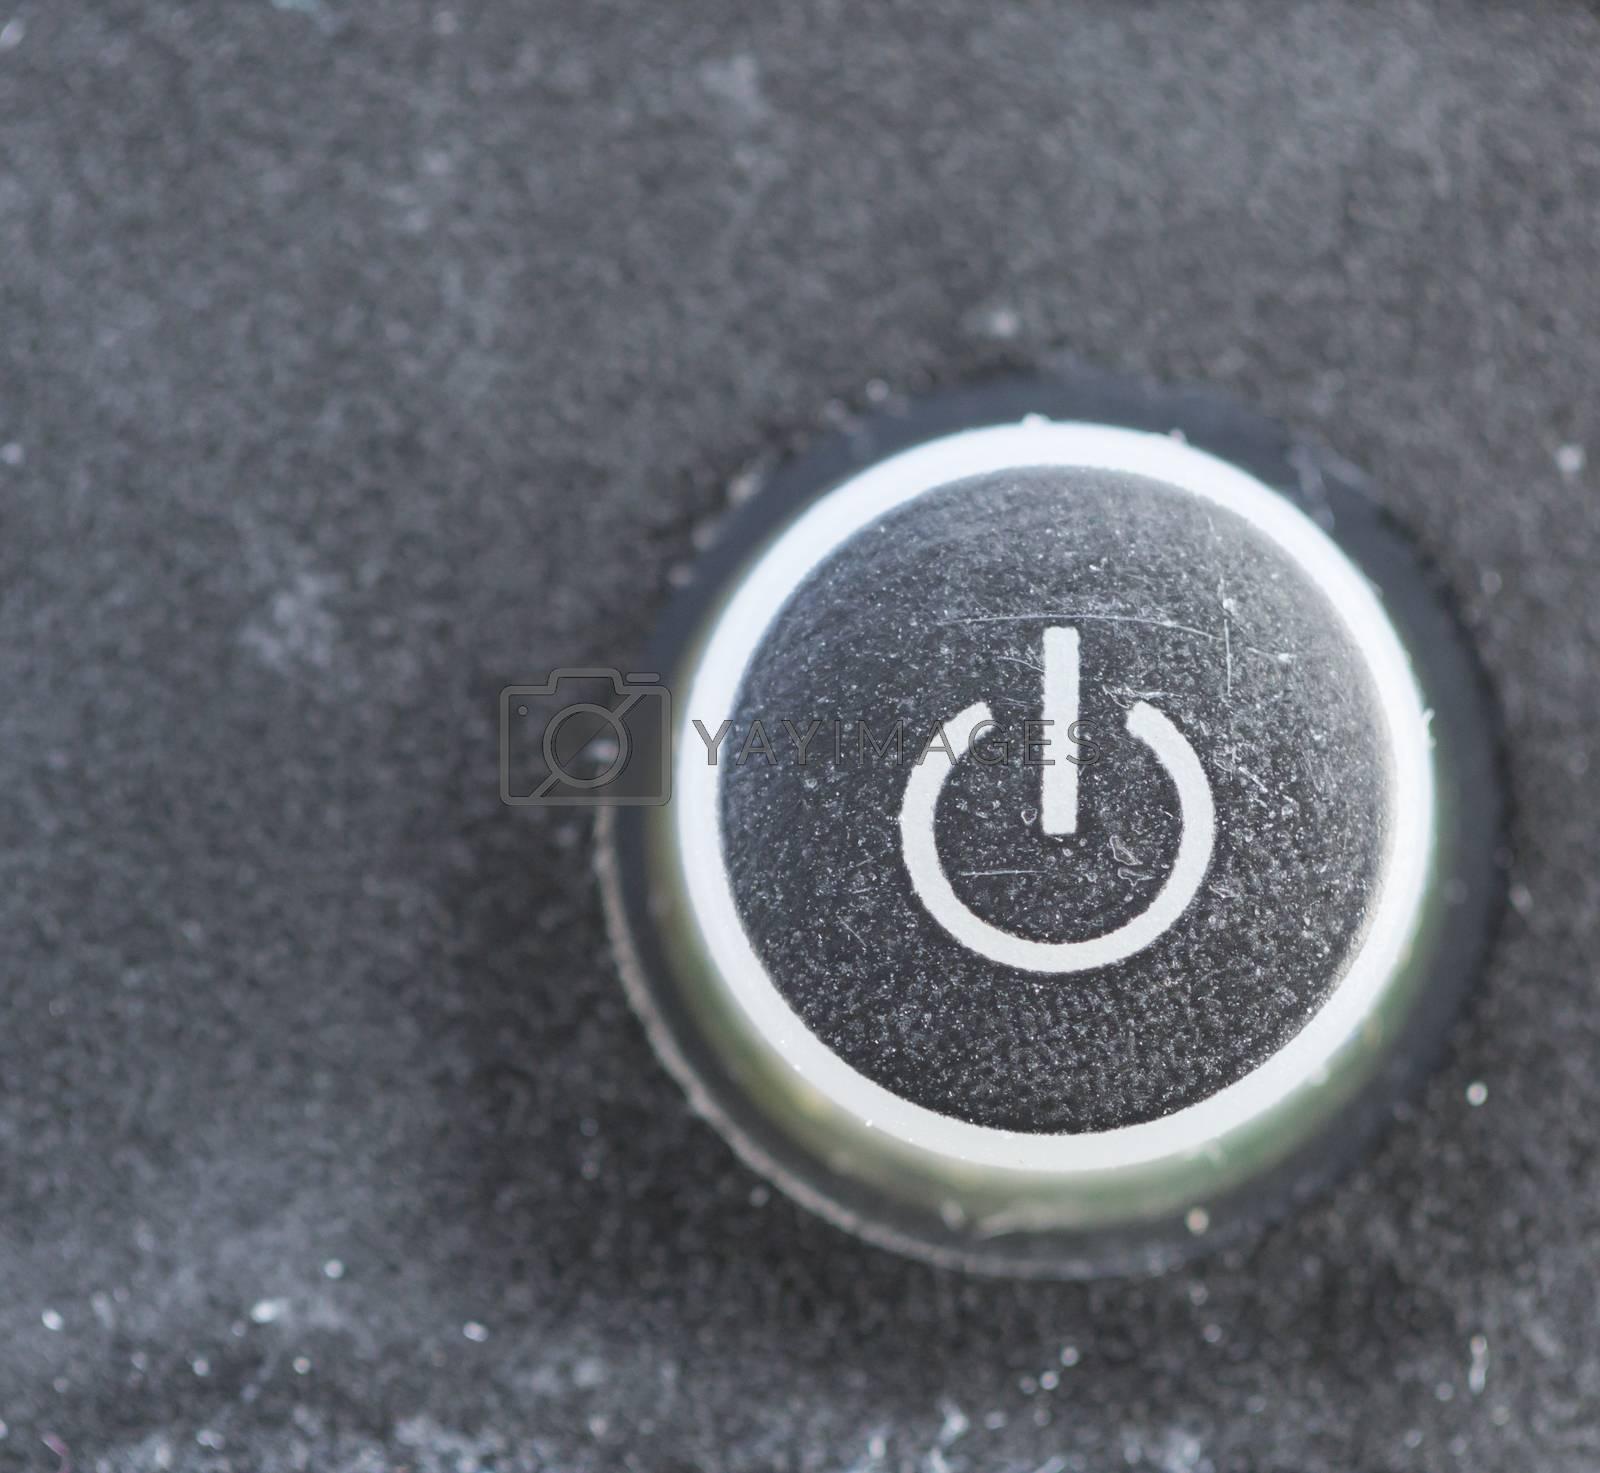 Powen on Button